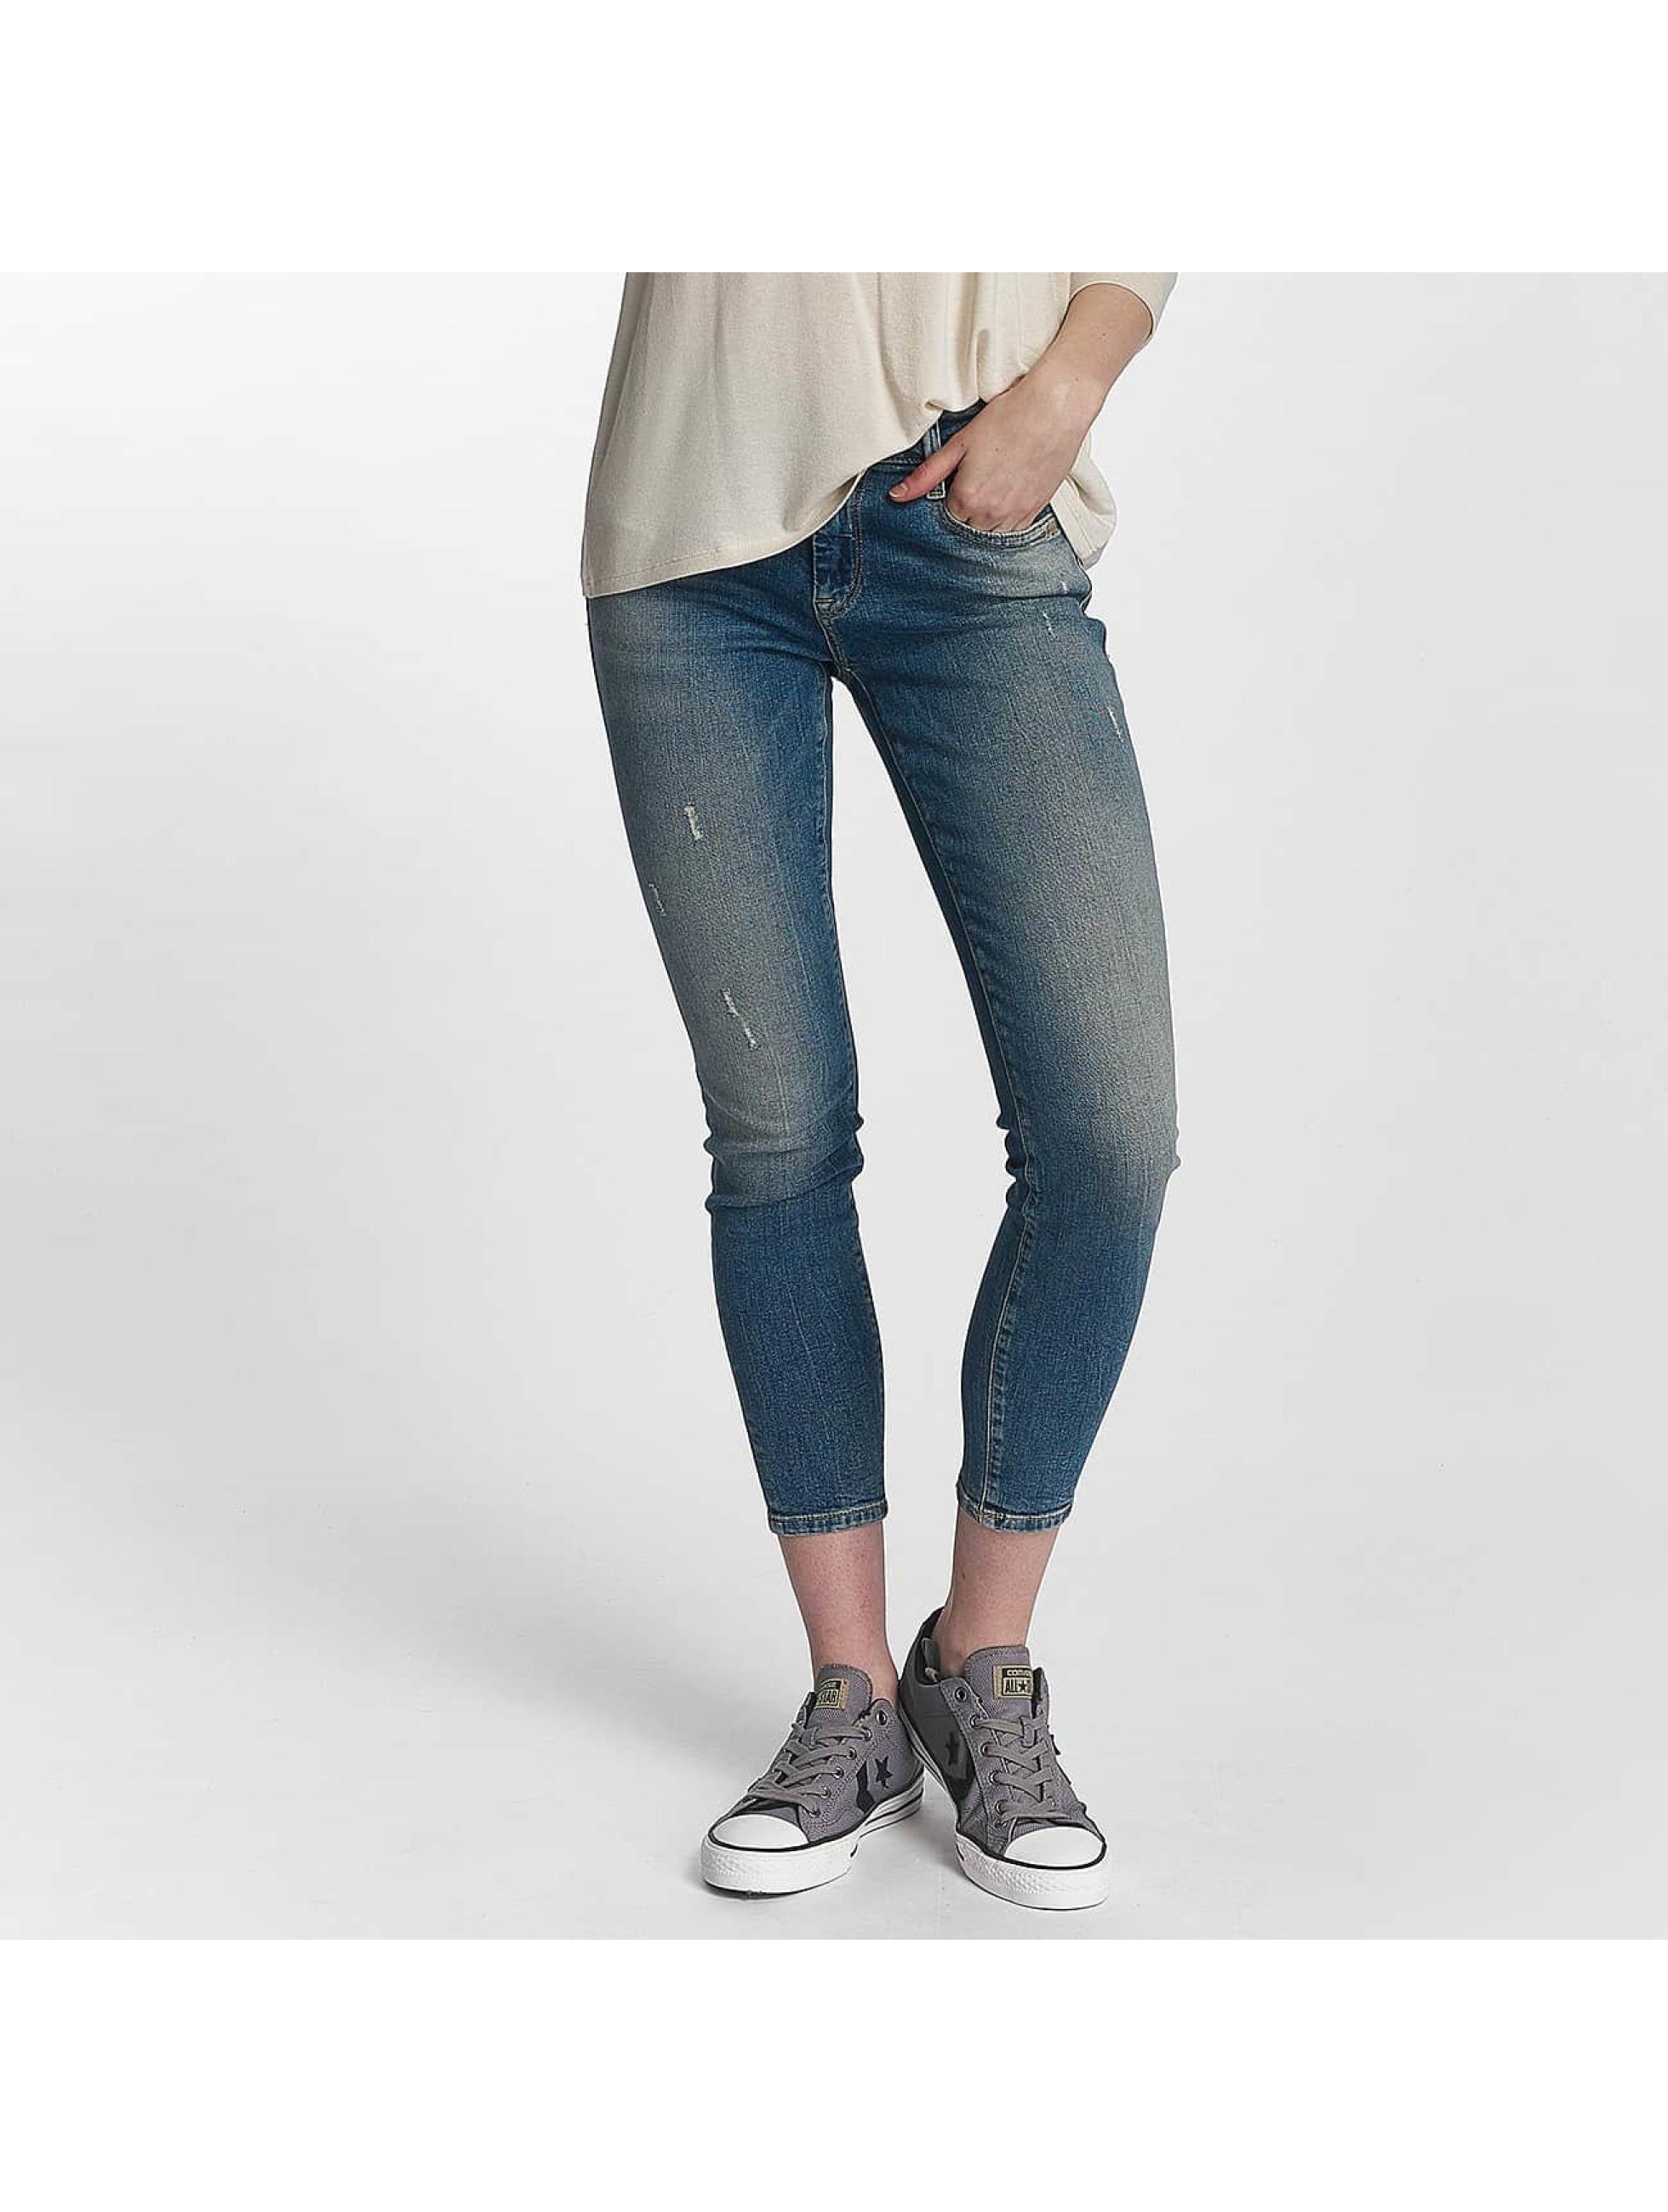 Mavi Jeans Frauen Skinny Jeans Adriana Mid Rise Super Skinny in blau